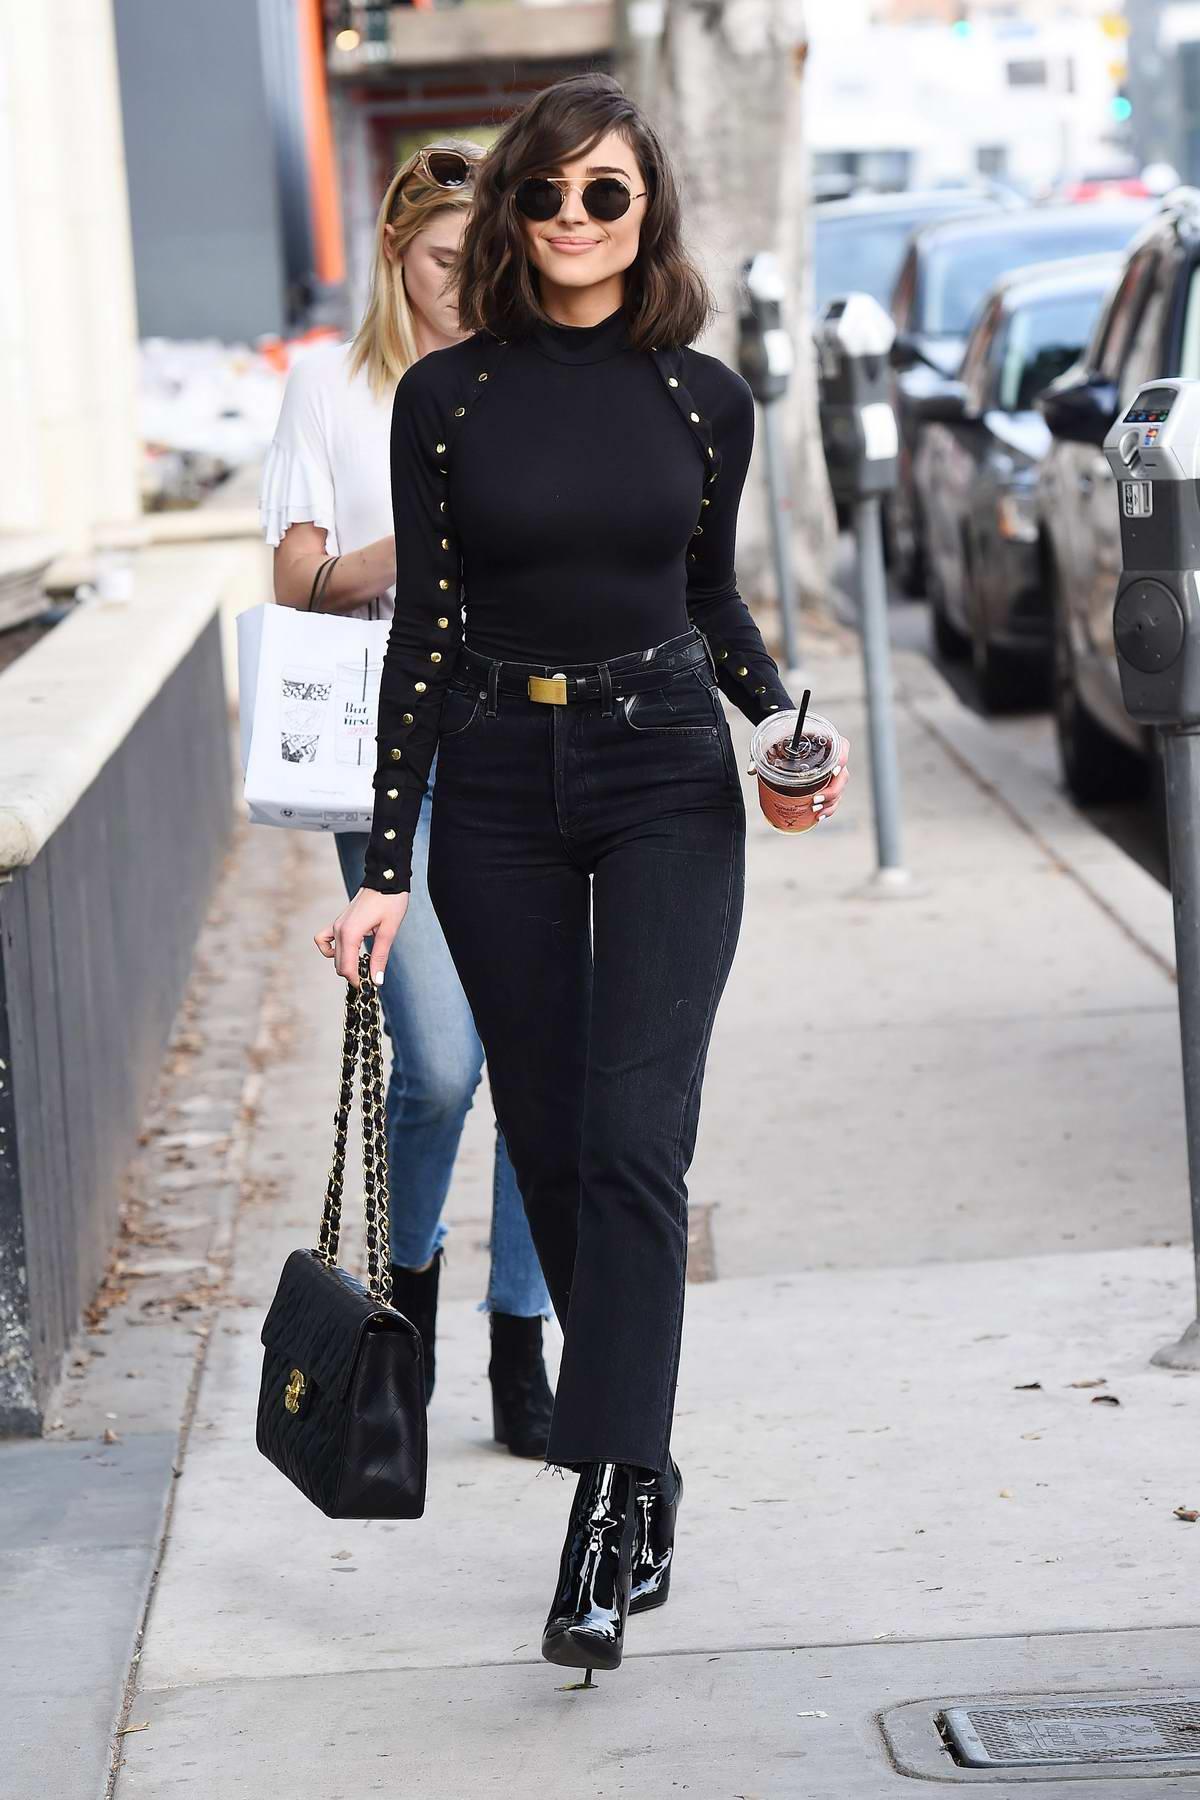 Olivia Culpo rocks in all black as she makes a coffee run in Los Angeles